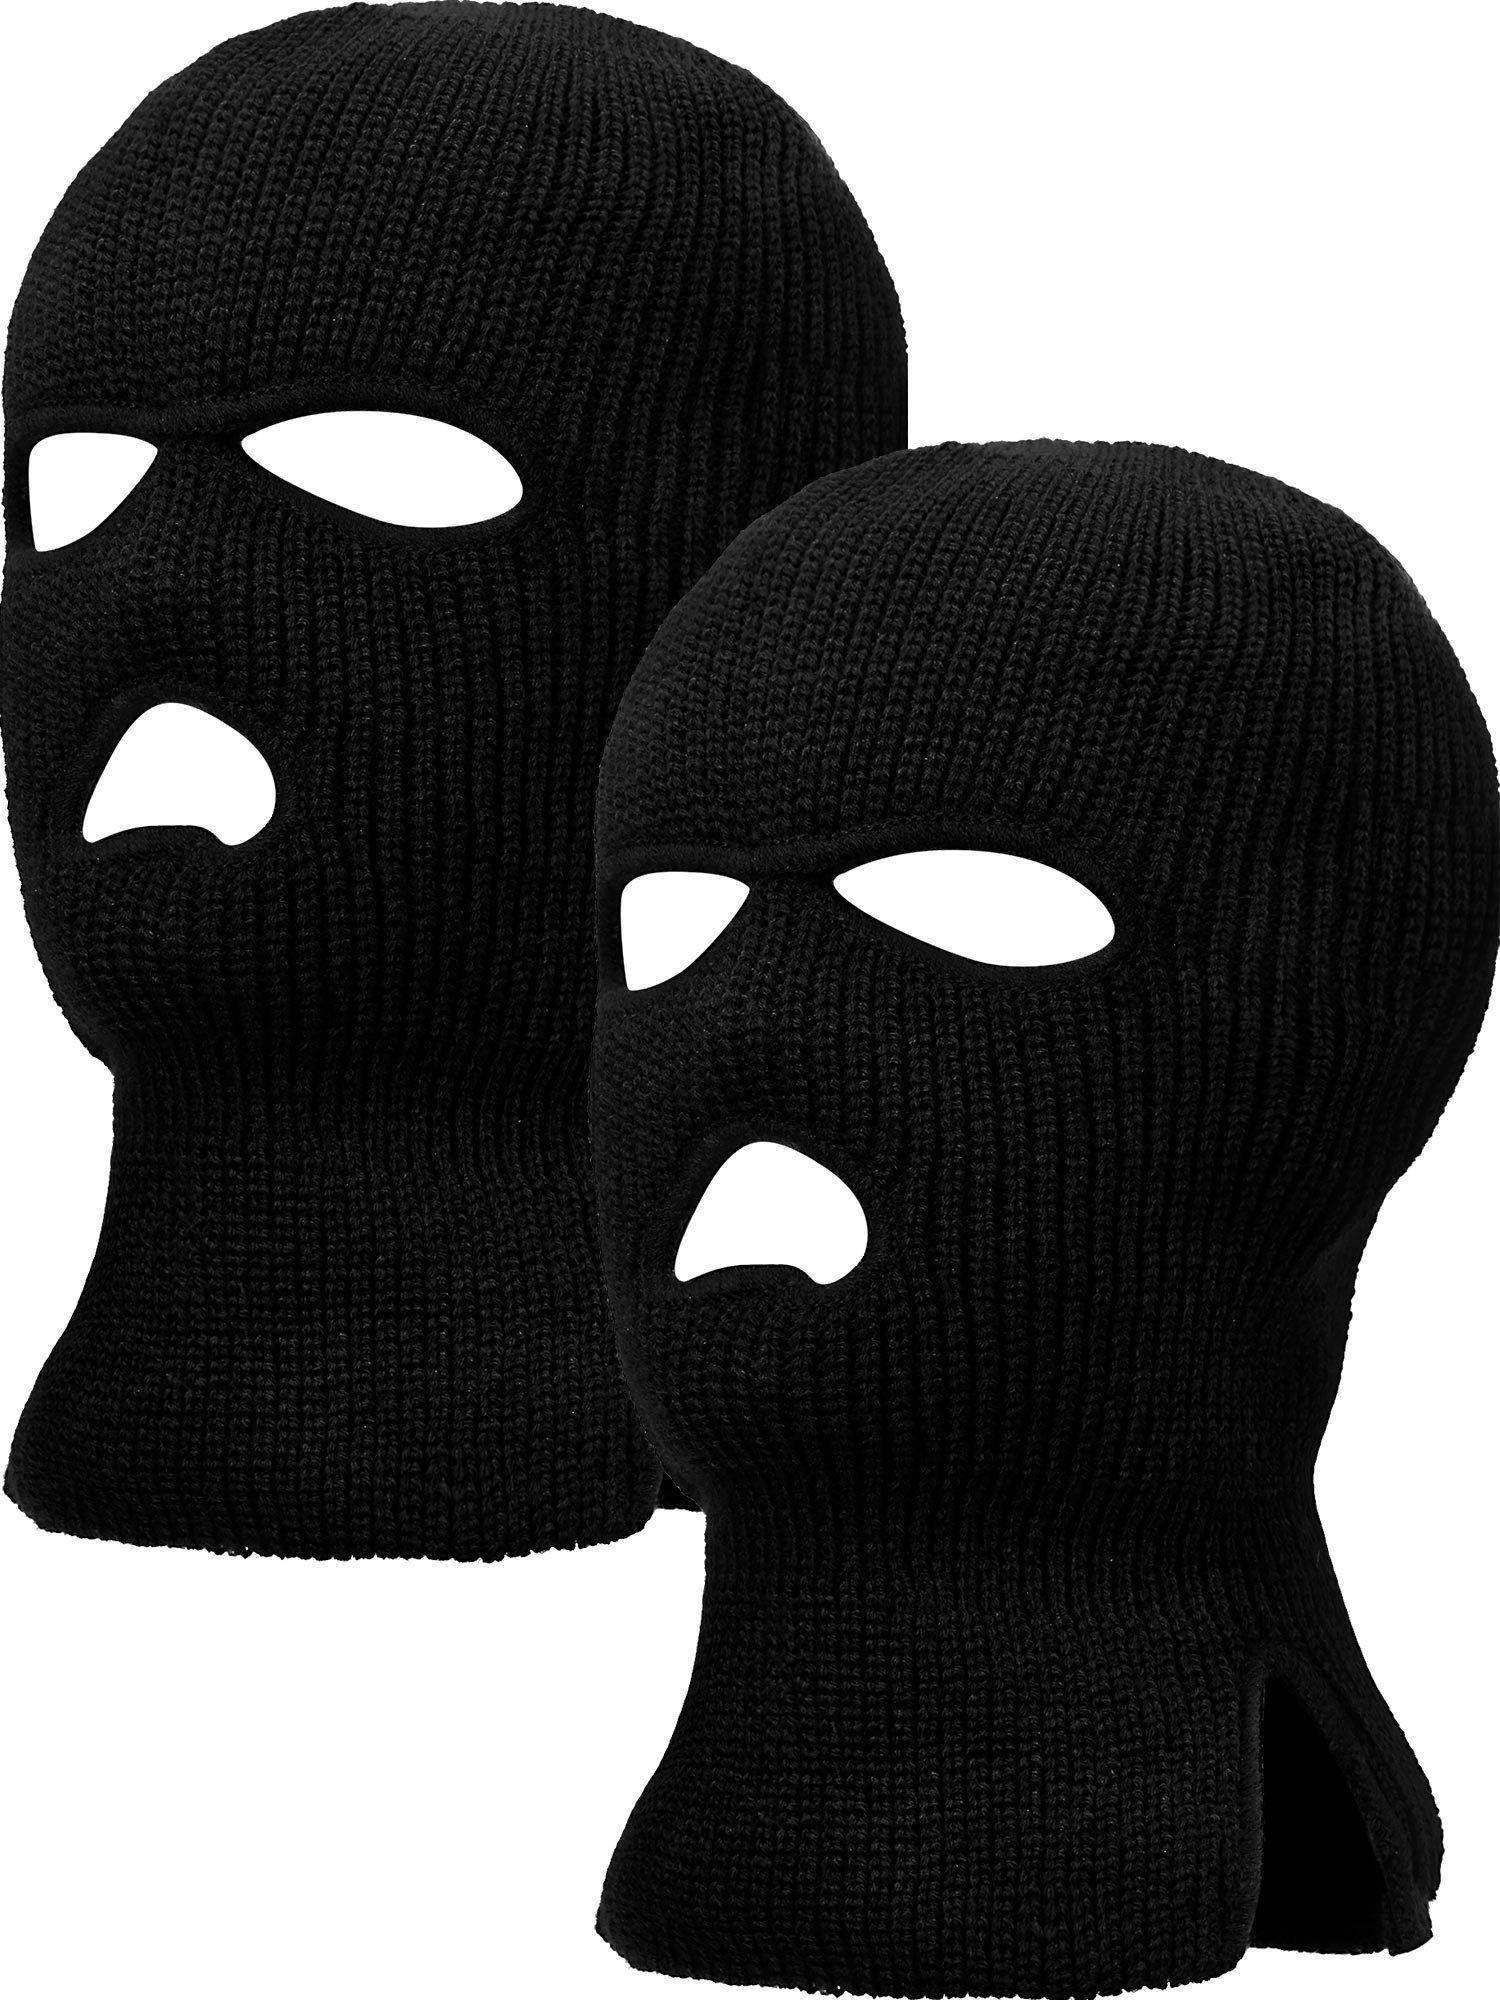 3 Hole Warm Ski Mask Balaclava Black Full Face Shield Beanie Cap Winter Outdoor